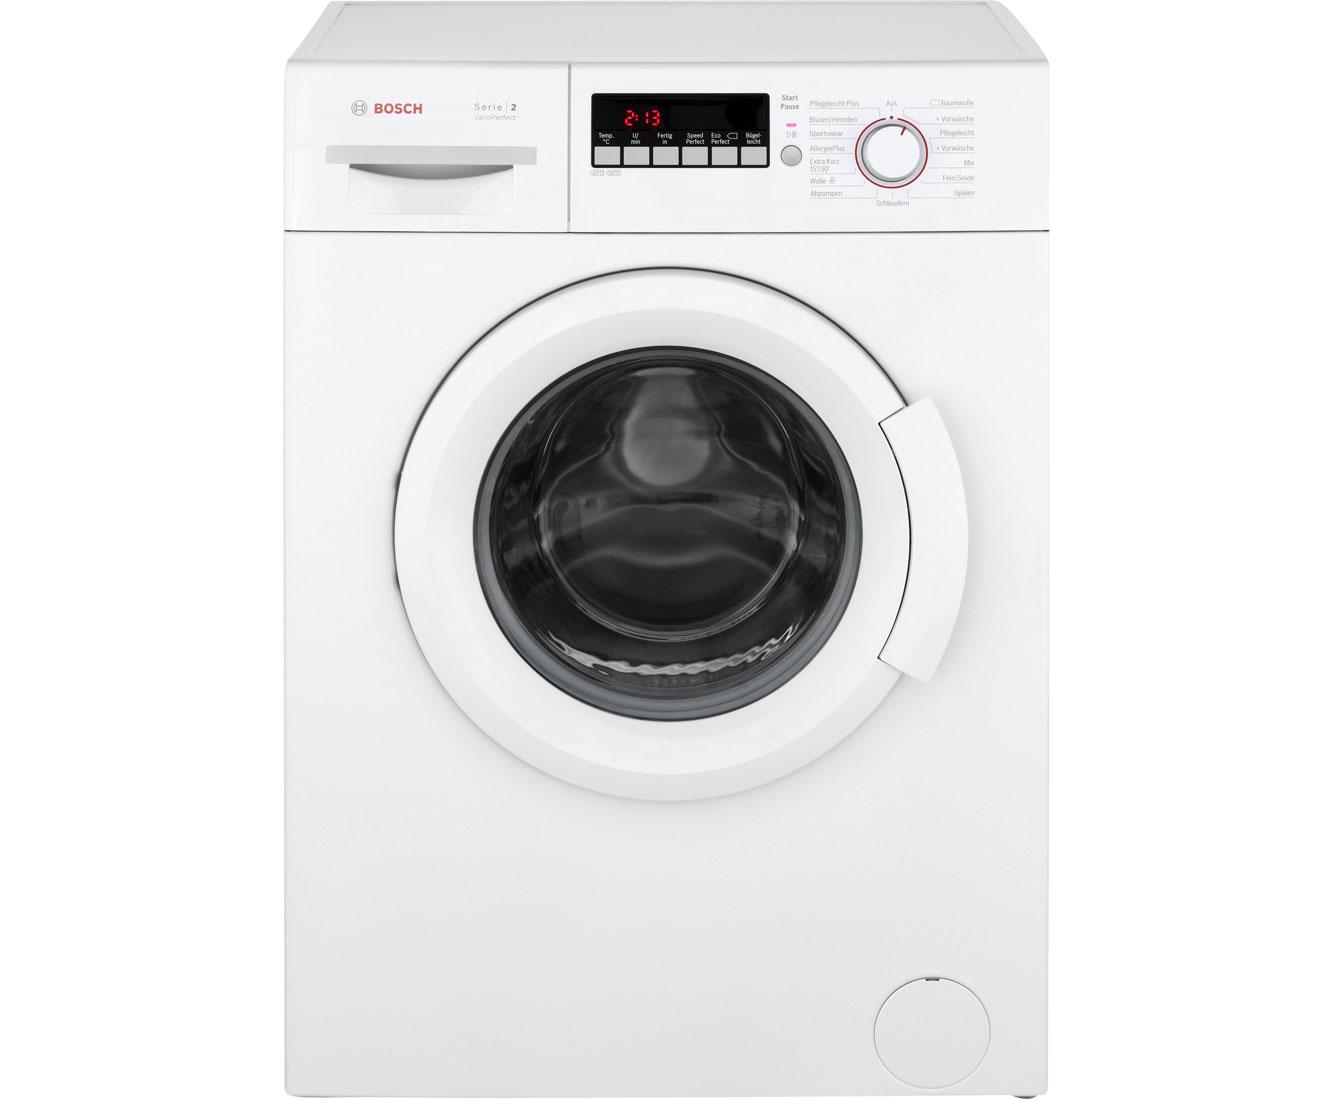 Bosch classixx wab waschmaschine kg u min a